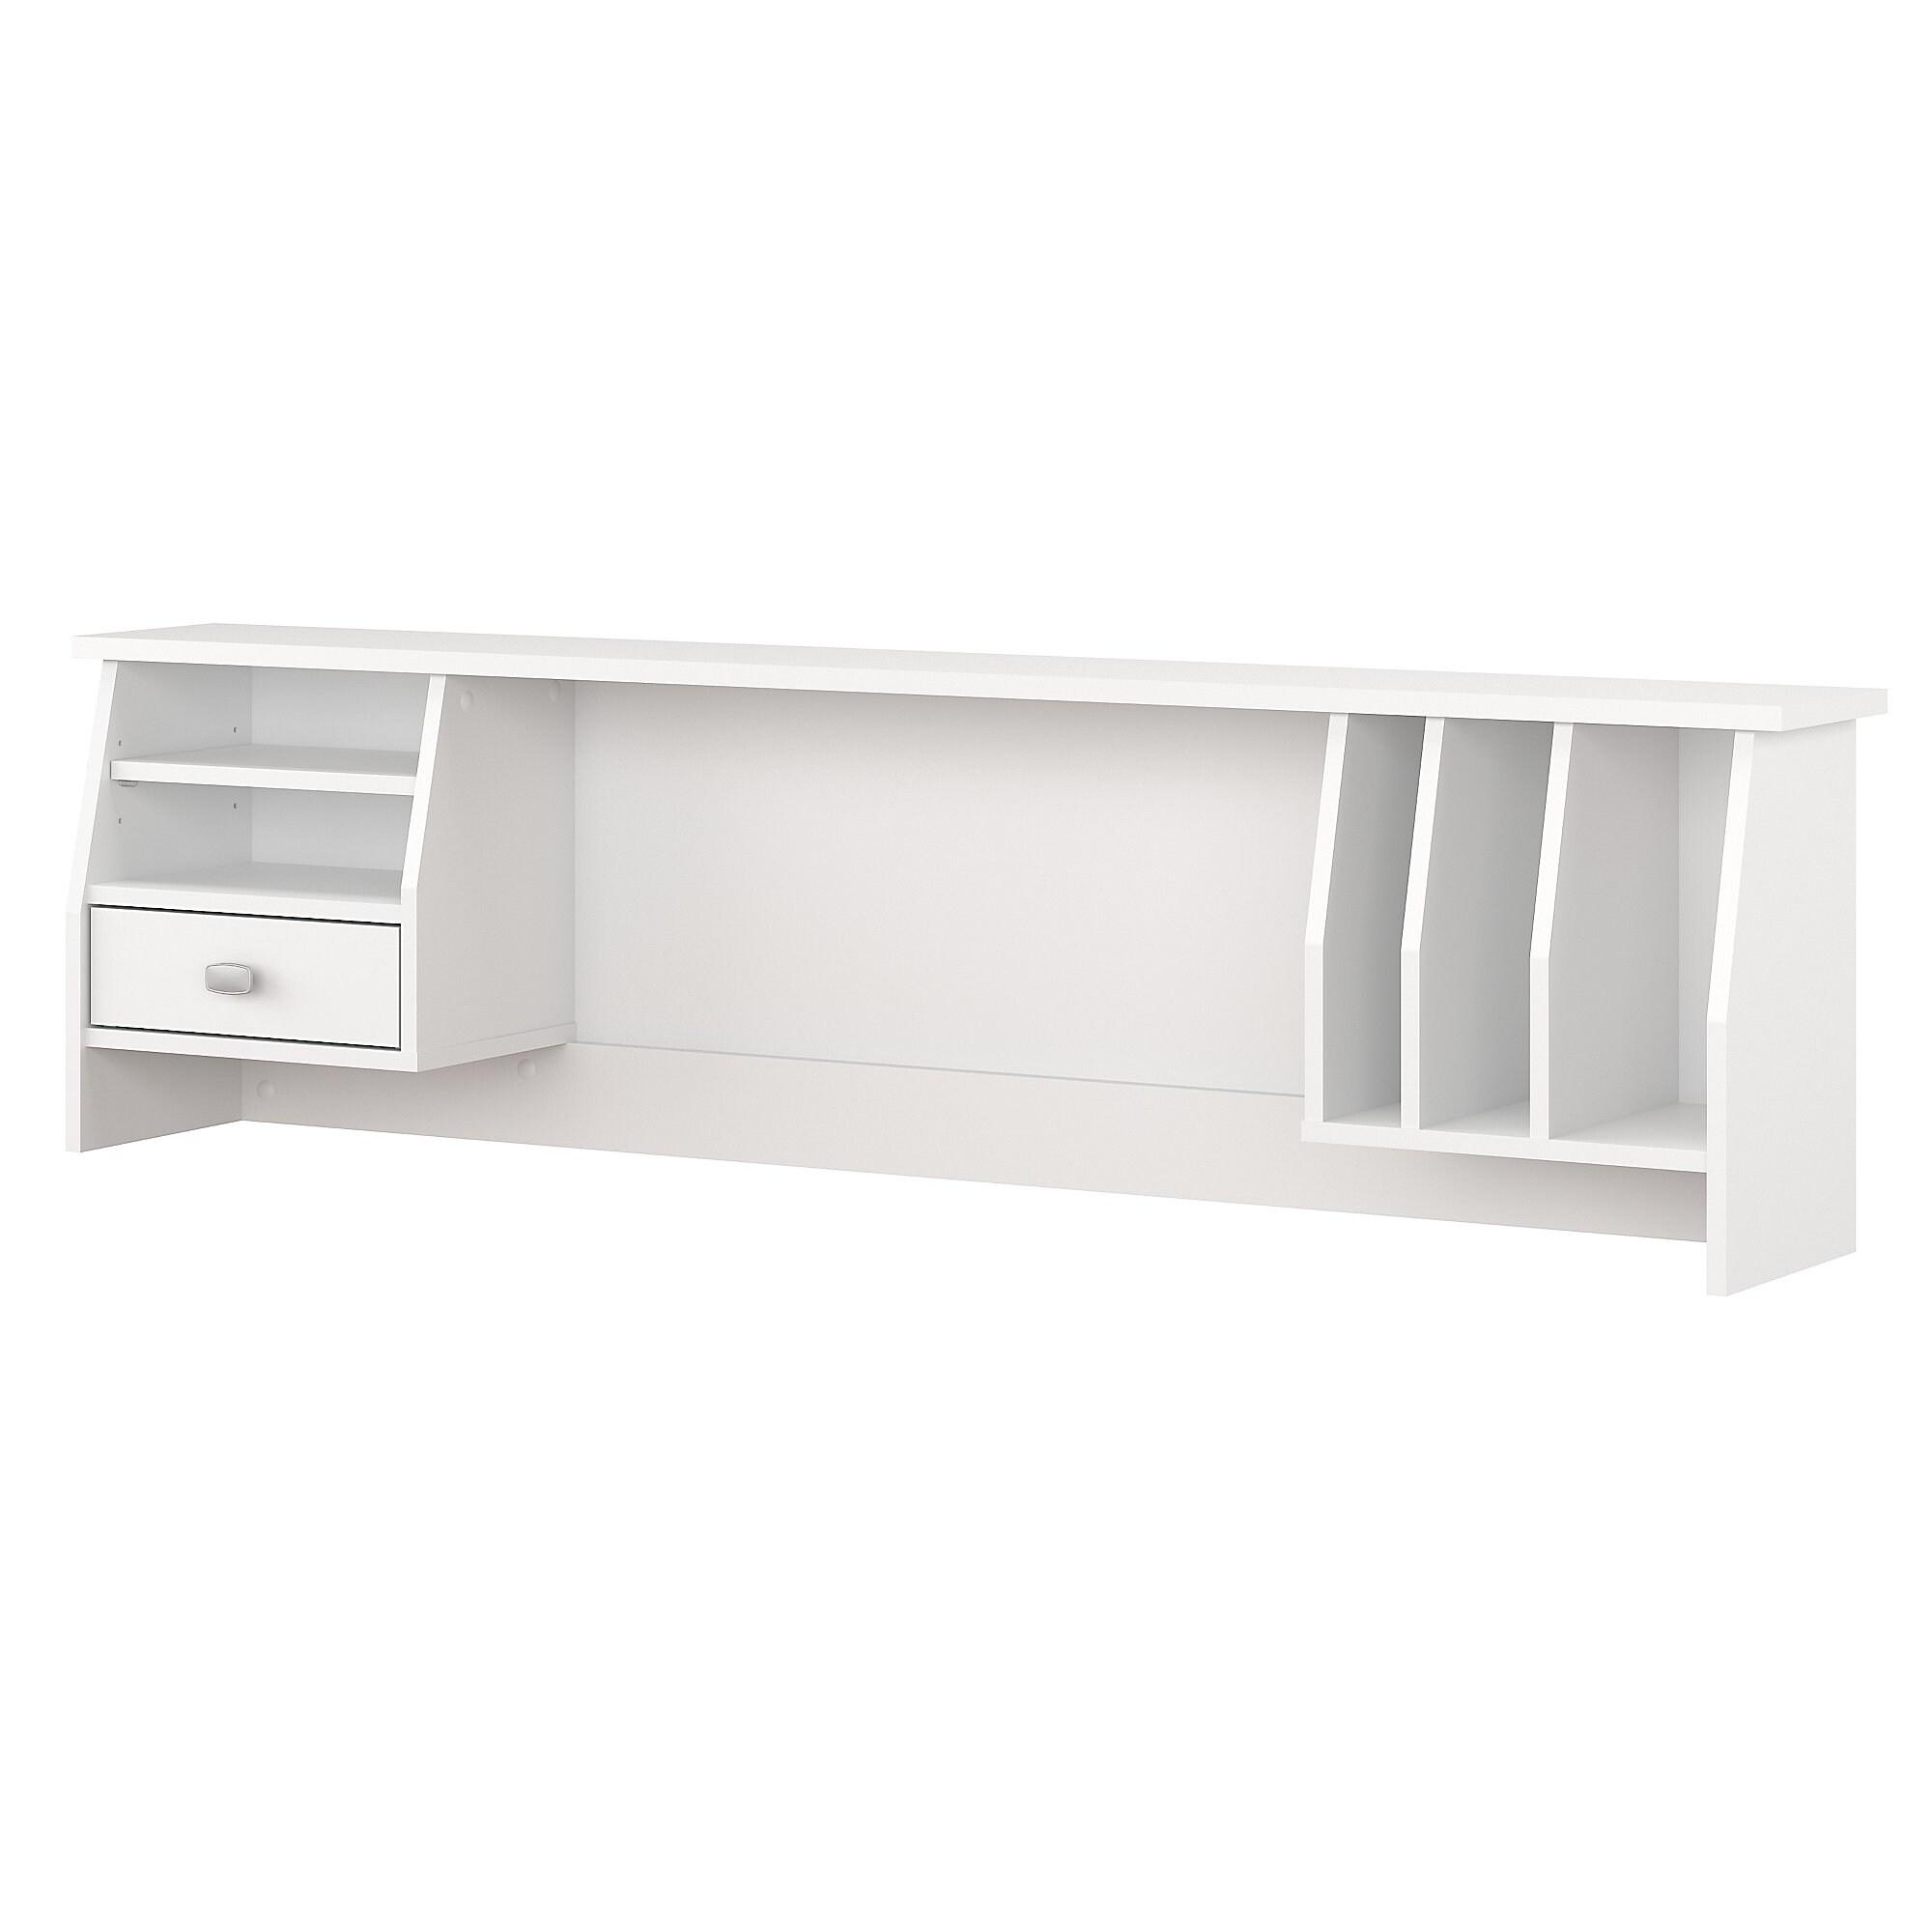 "Copper Grove Rustavi 32-inch White Small Hutch Organizer (Pairs with  32-inch Desks NOT Included) - 32.32""L x 32.32""W x 32.32""H"